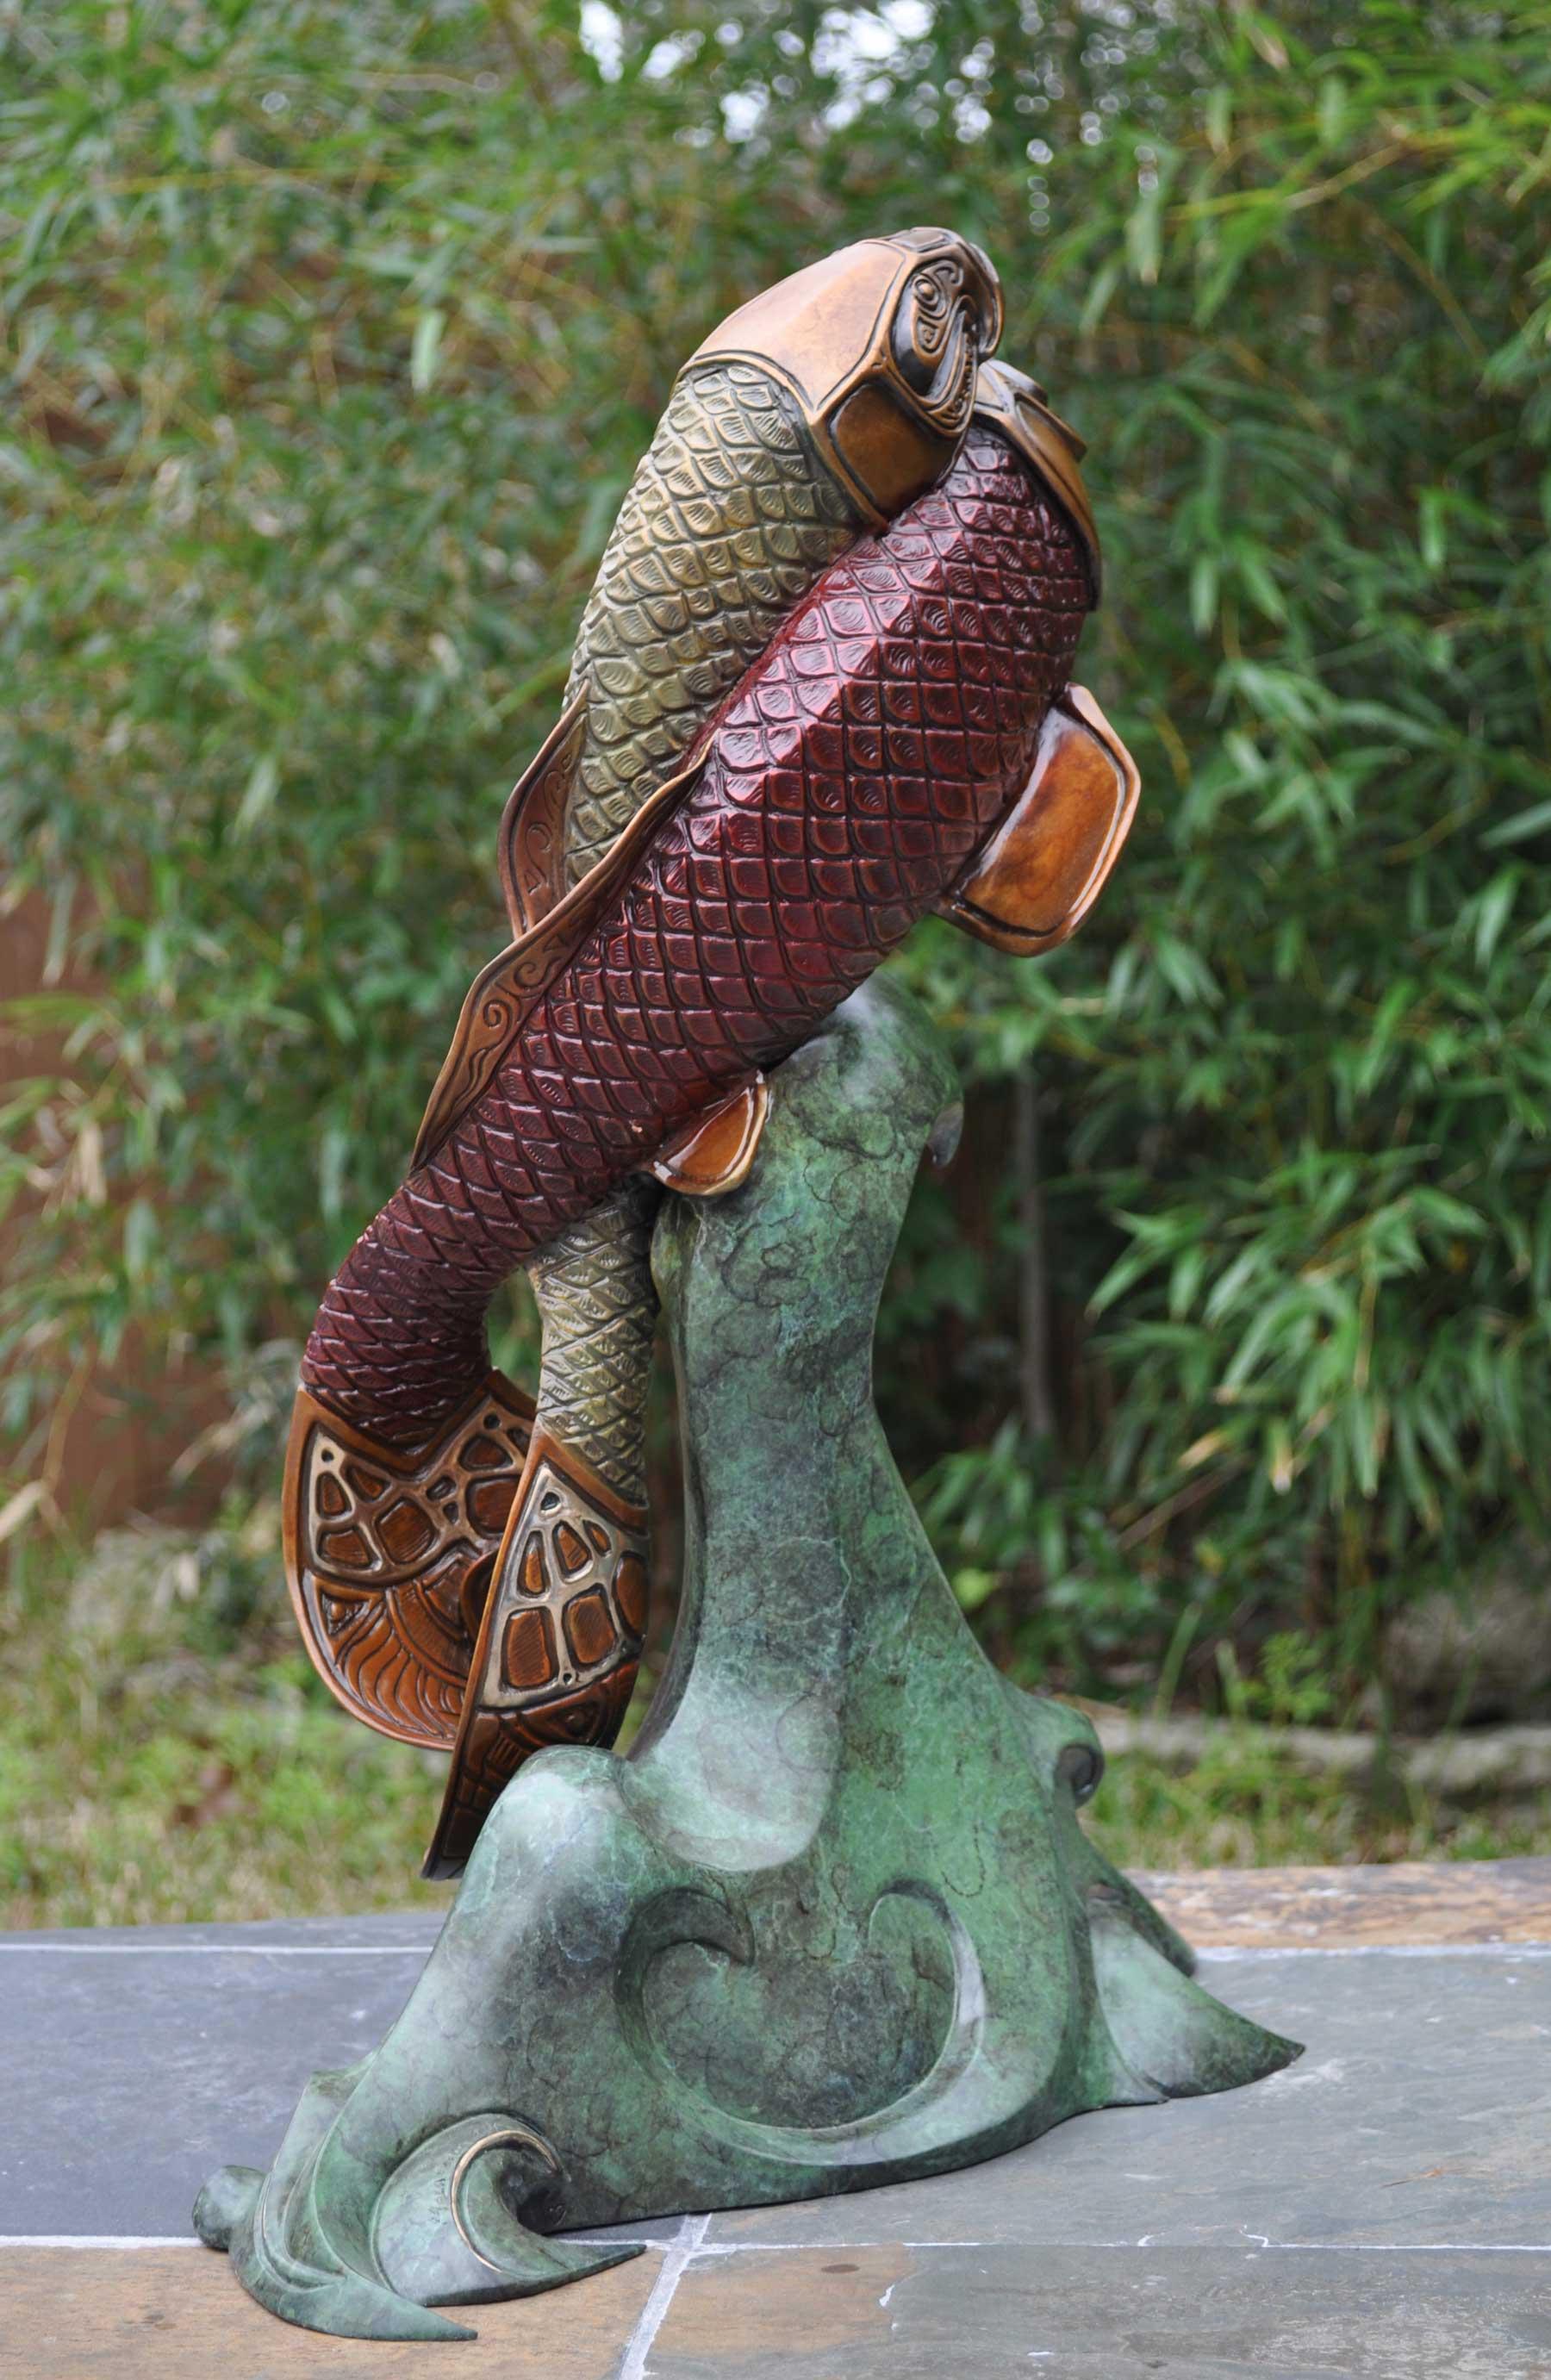 bronze-koi-fountain-sculpture-john-maisano-2.jpg